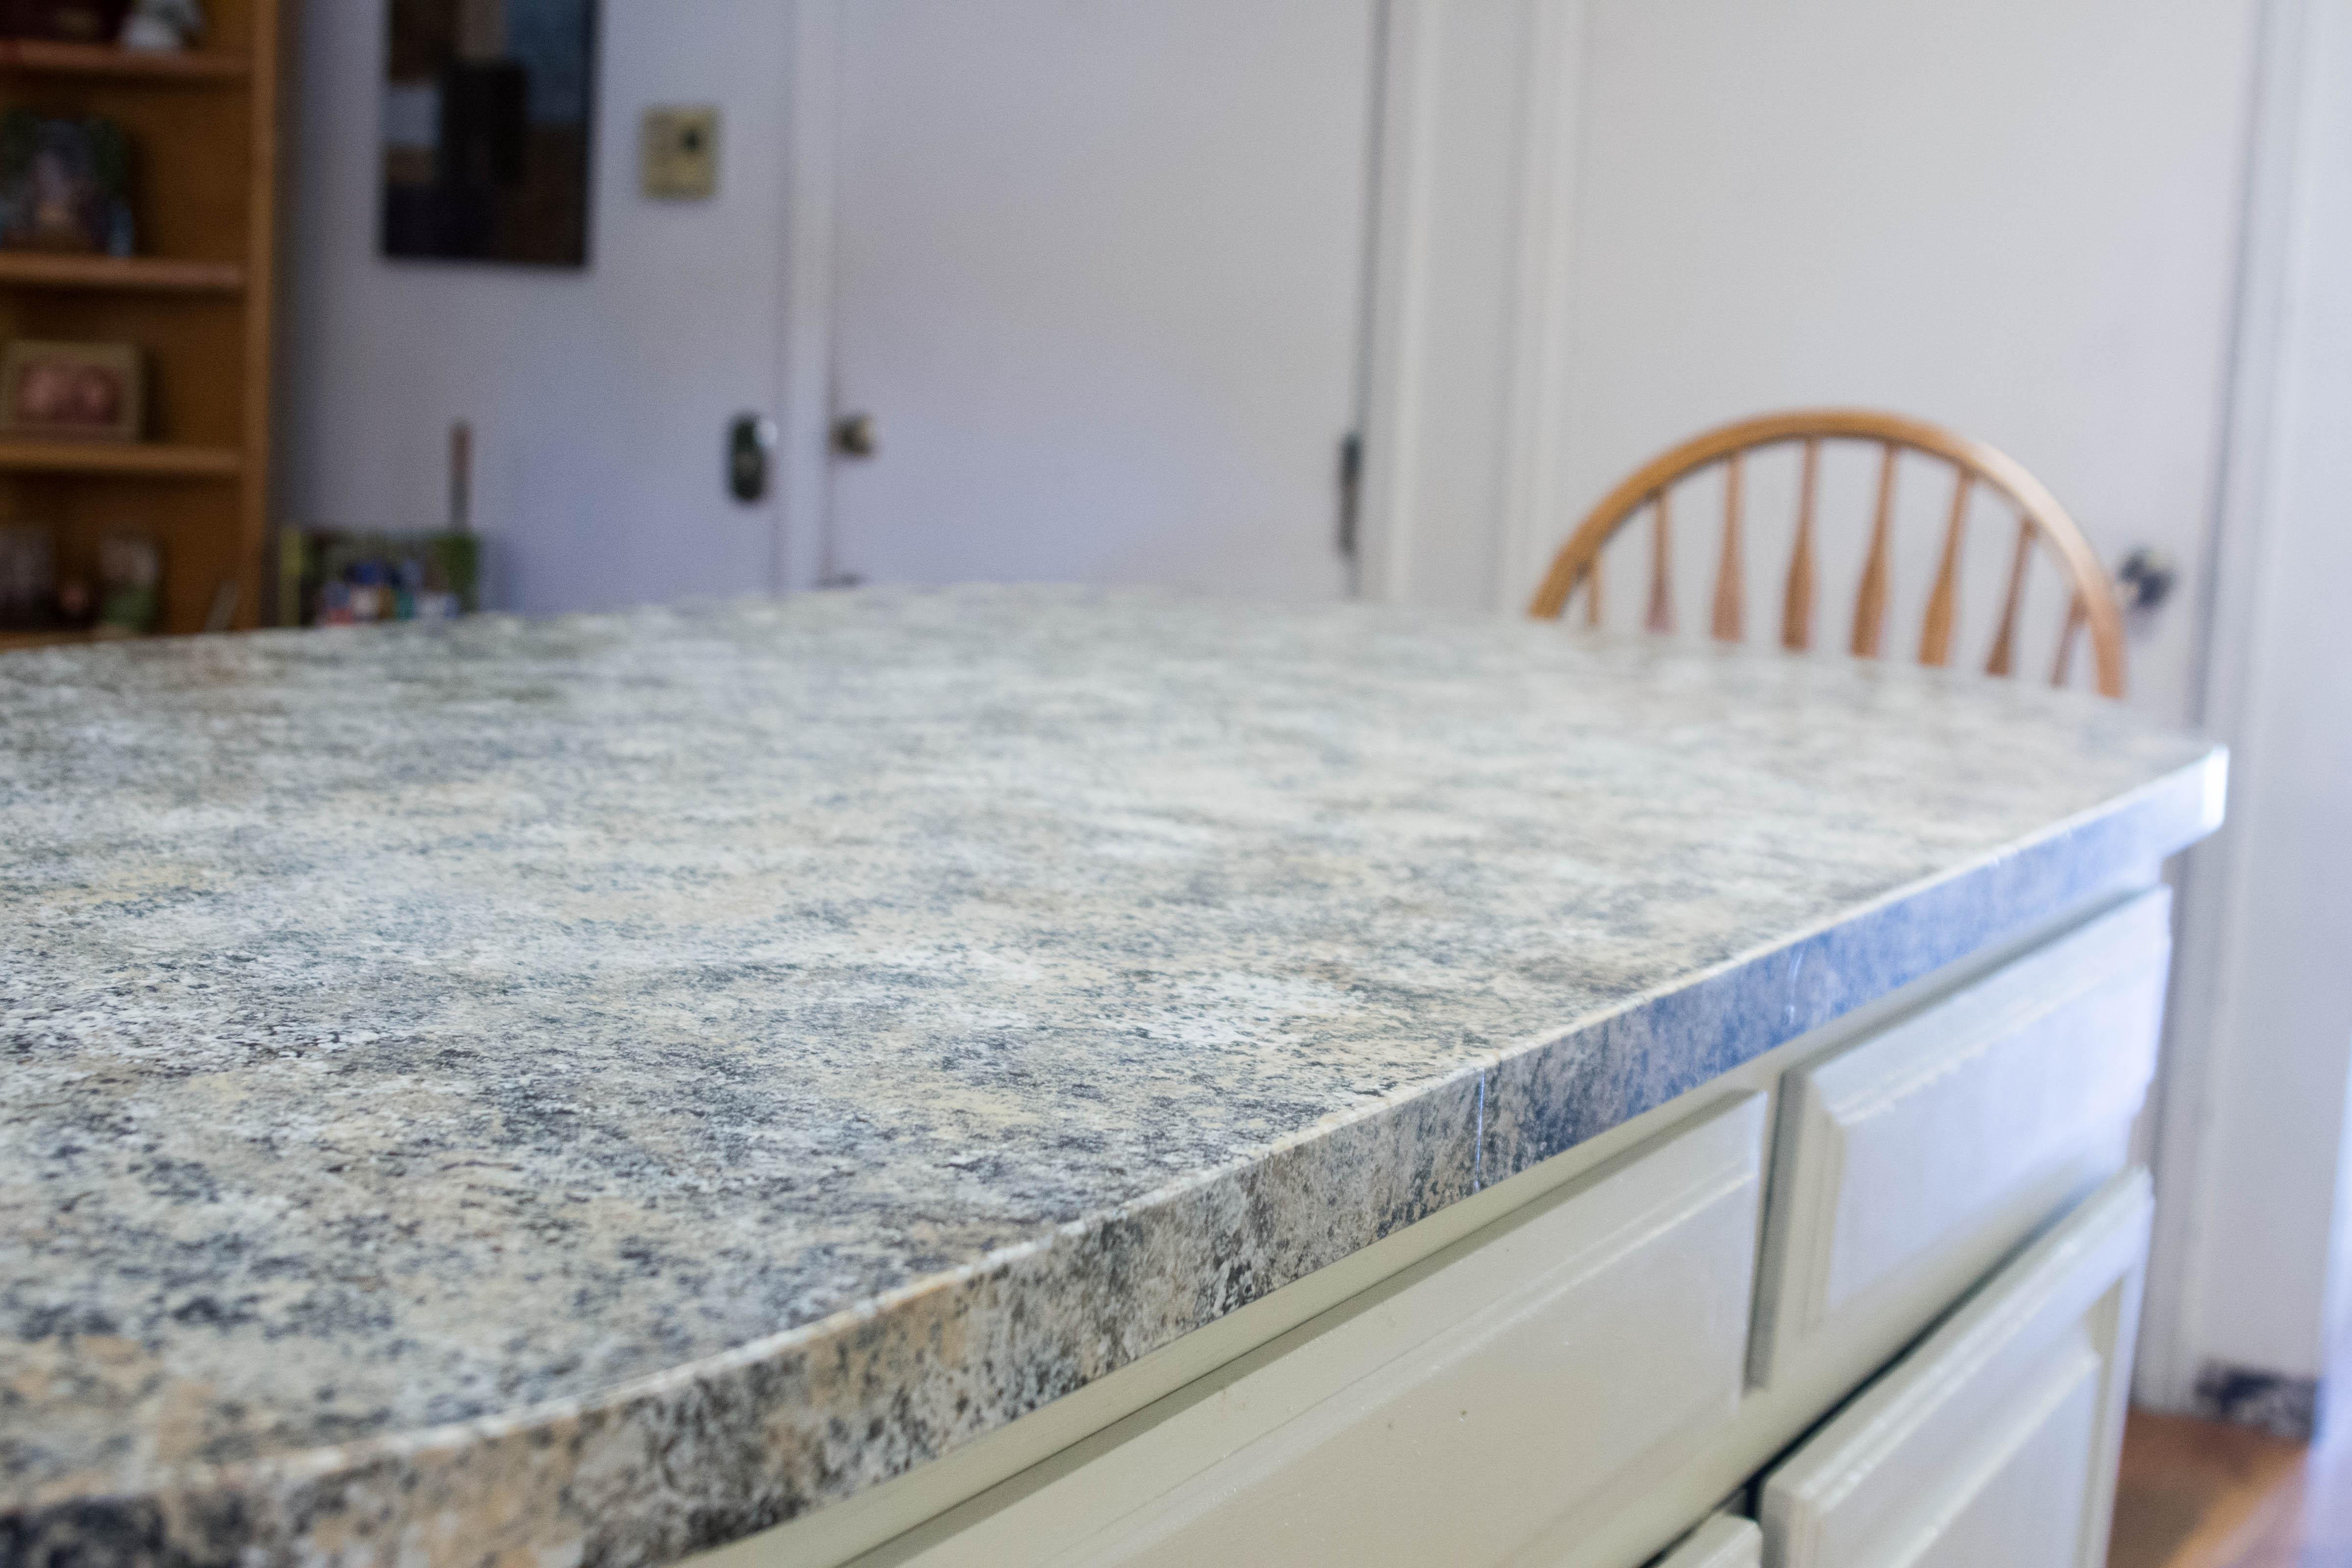 Resurfacing Bathroom Countertops Diy Countertop Resurfacing With ...